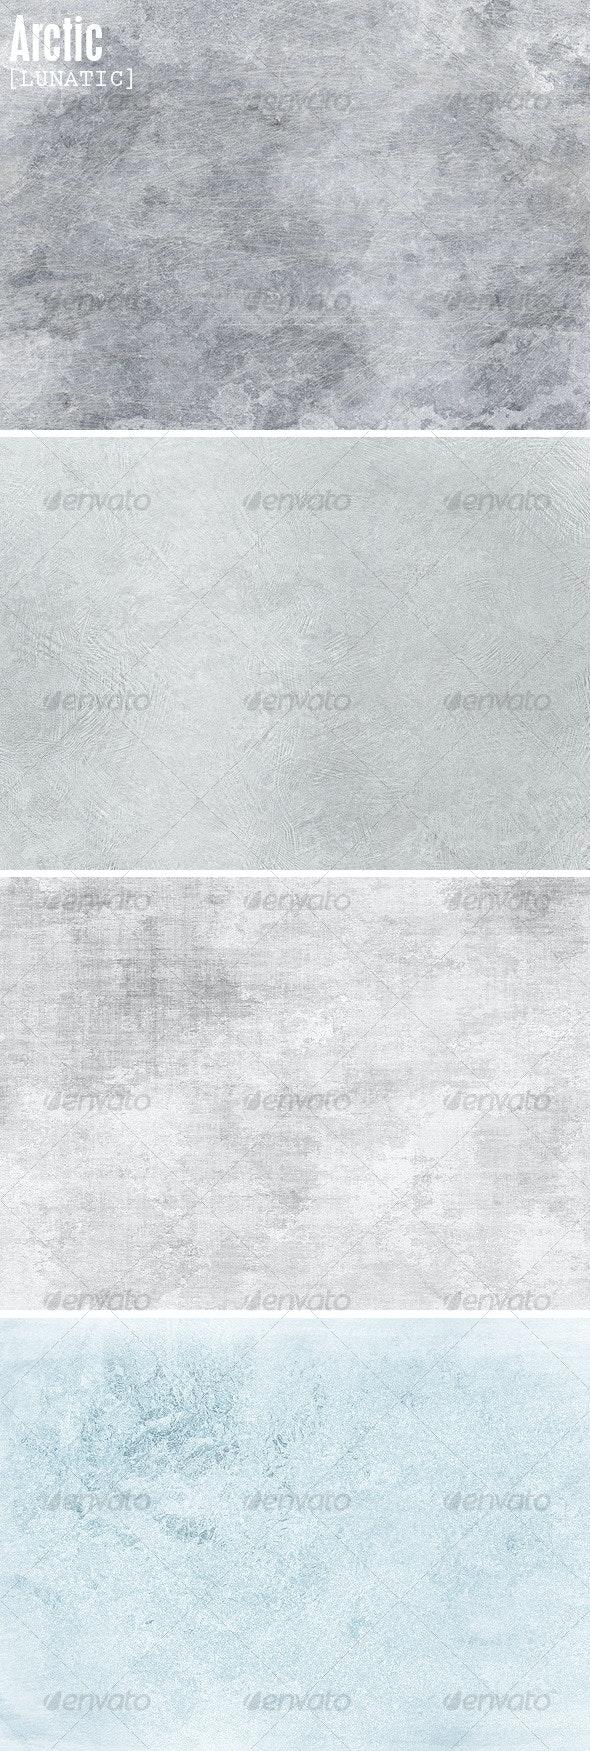 Arctic Backgrounds - Nature Textures